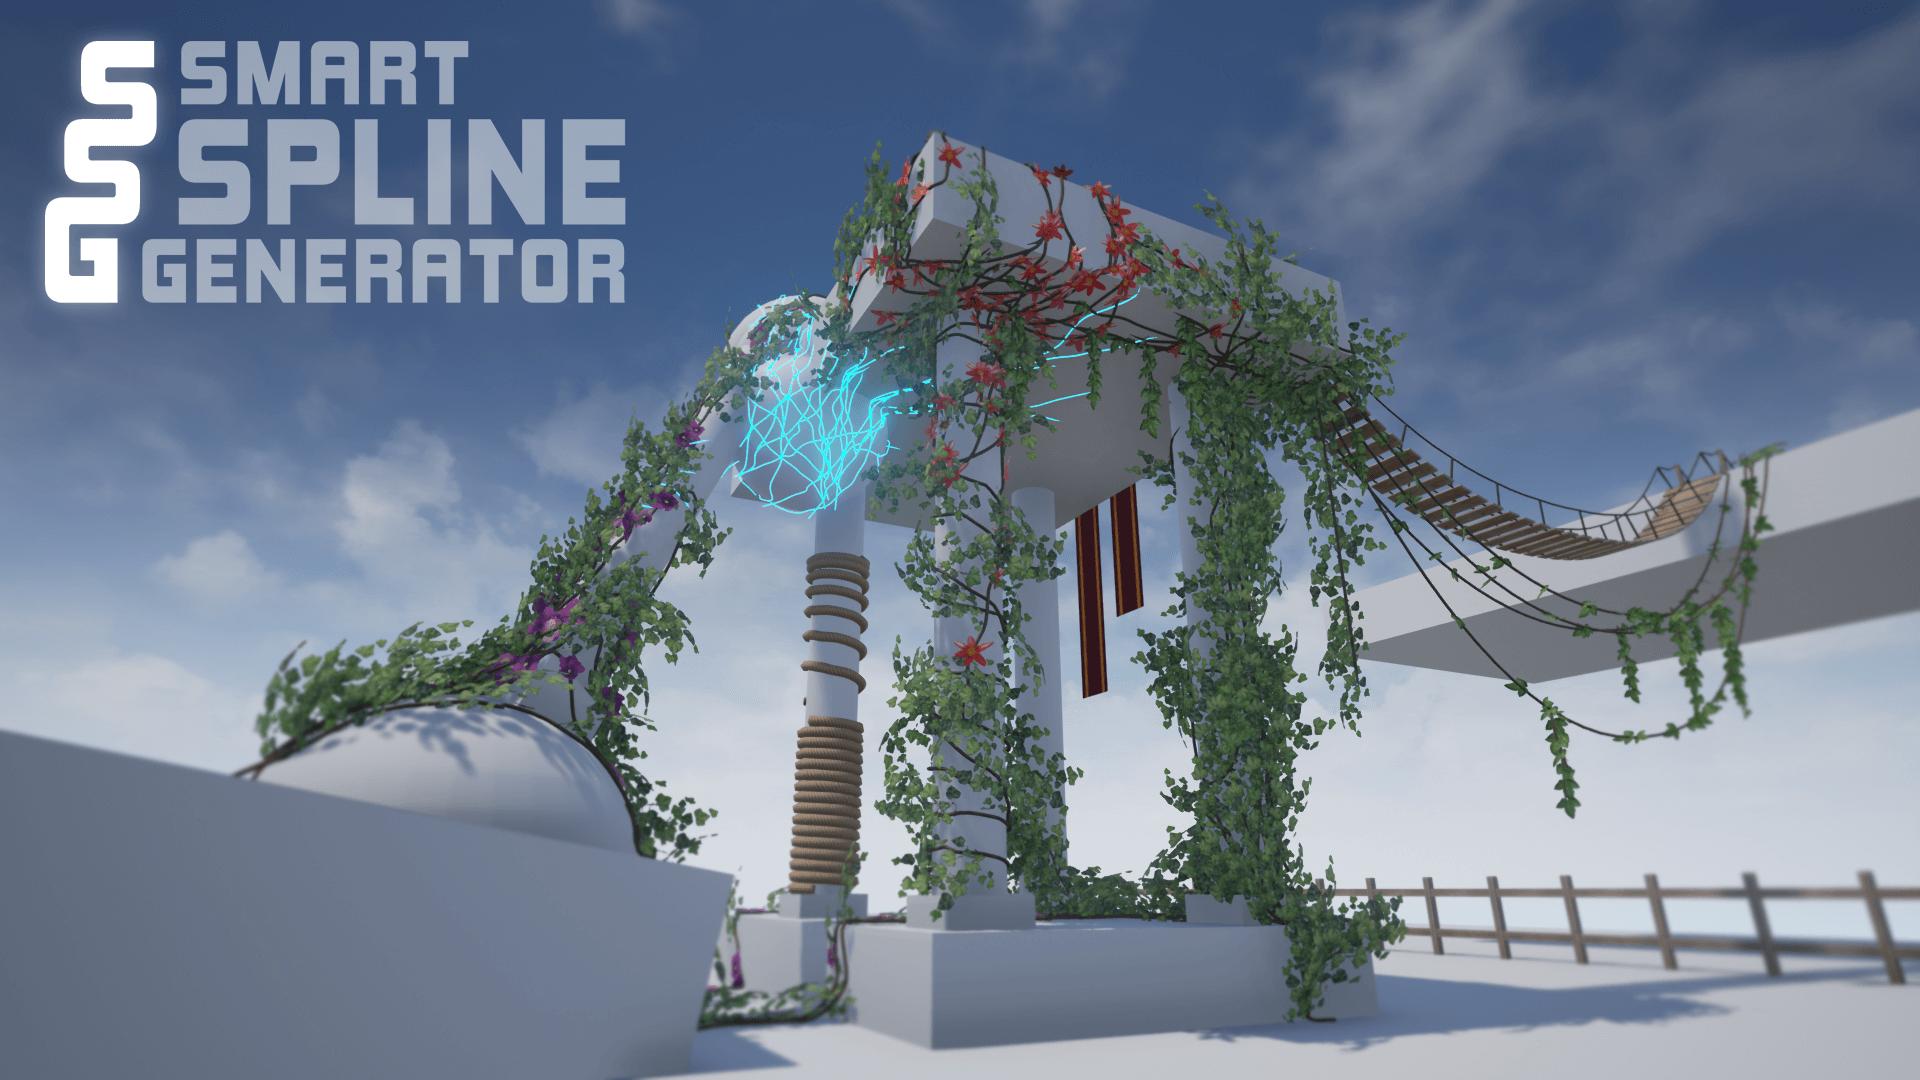 Smart spline generator by s krezel in blueprints ue4 marketplace share malvernweather Images